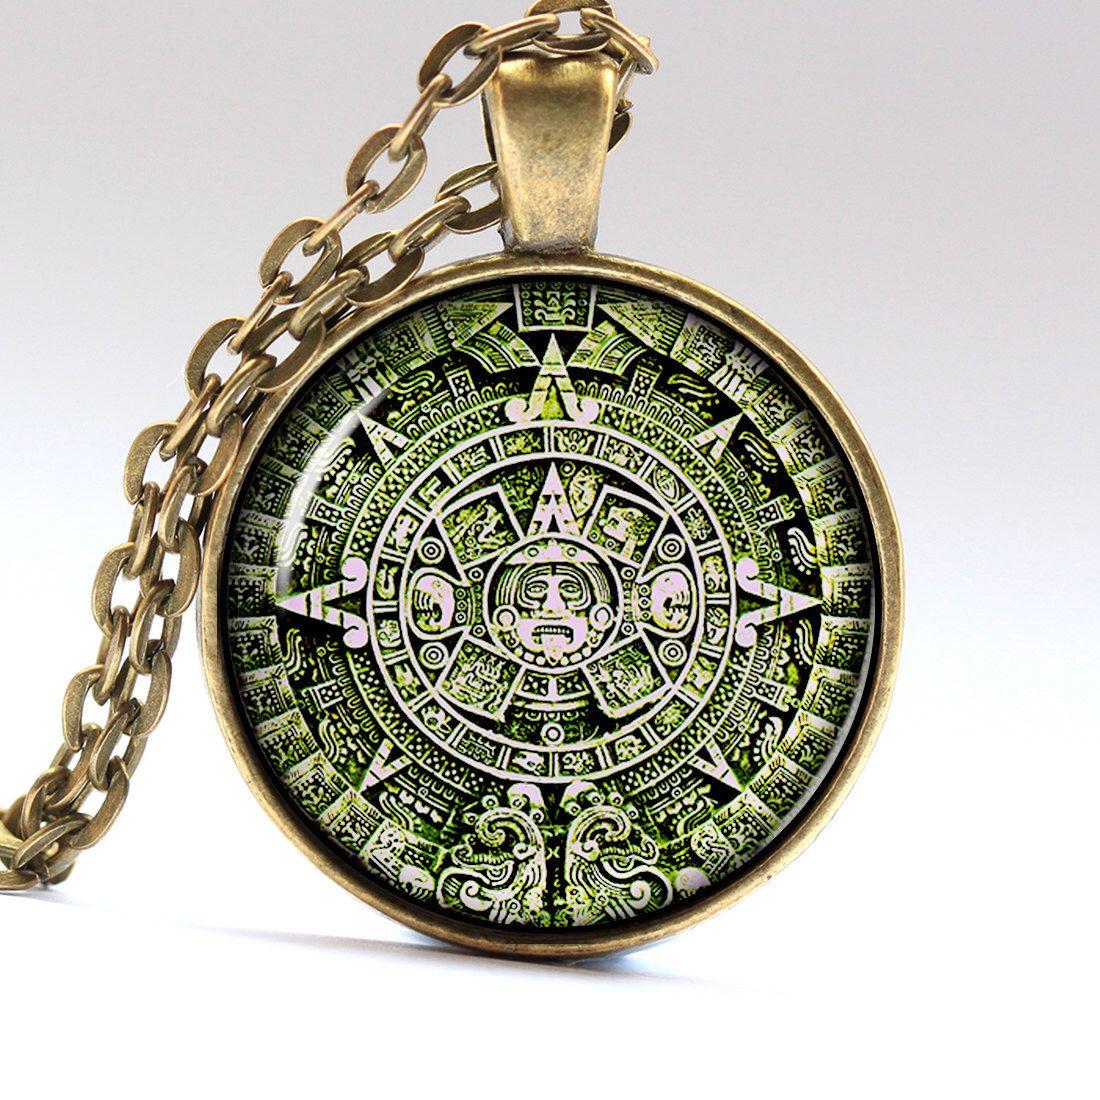 Green aztec jewelry aztec calendar mexican necklace aztec necklace green aztec jewelry aztec calendar mexican necklace aztec necklace aztec pendant mexican pendant mexican jewelry lg317 mozeypictures Gallery